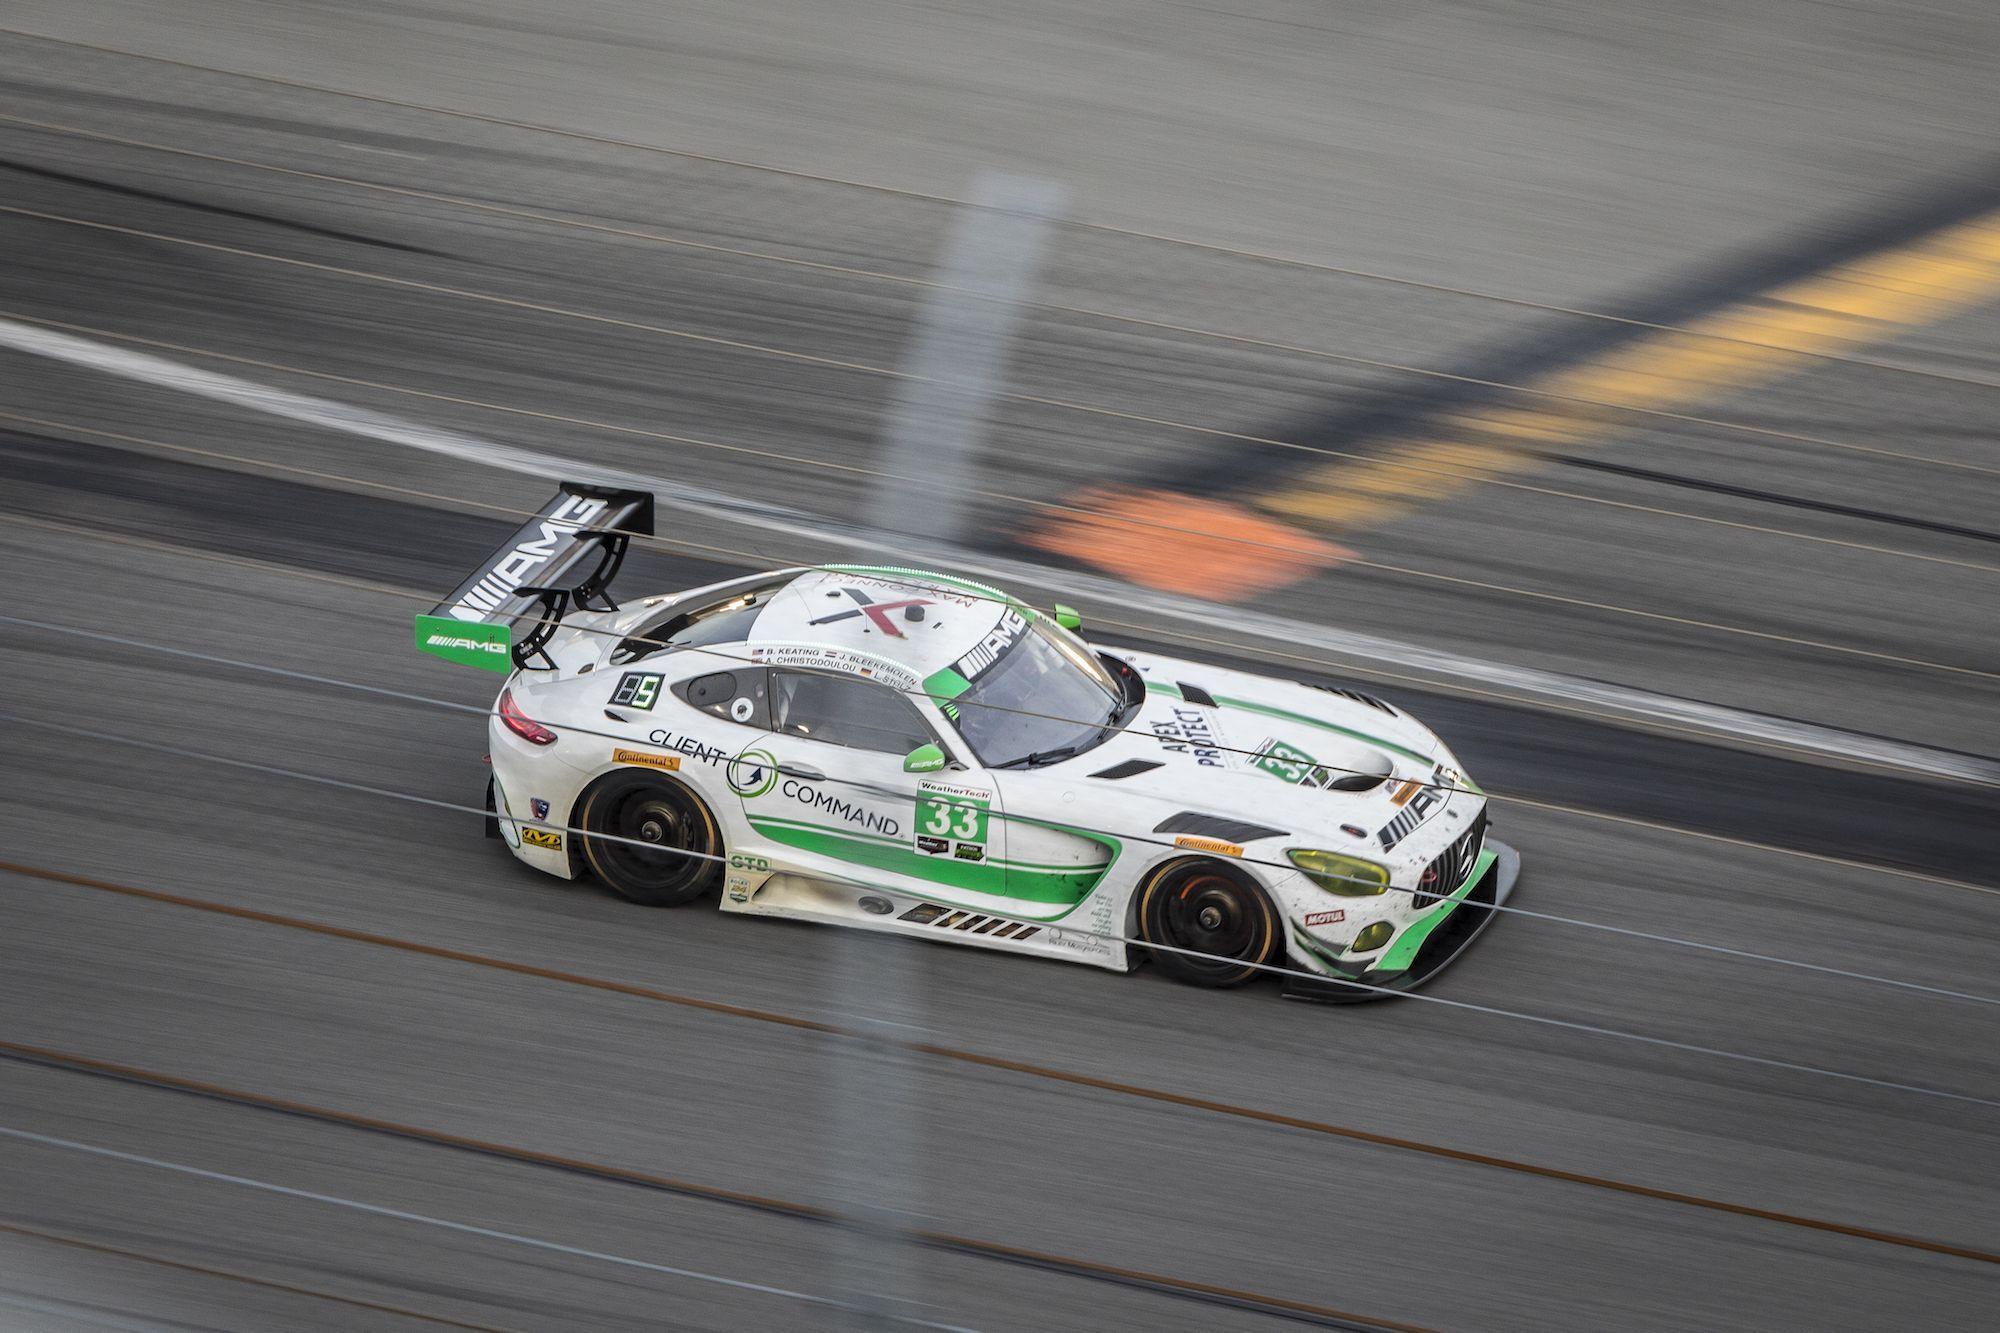 Racecar sex position